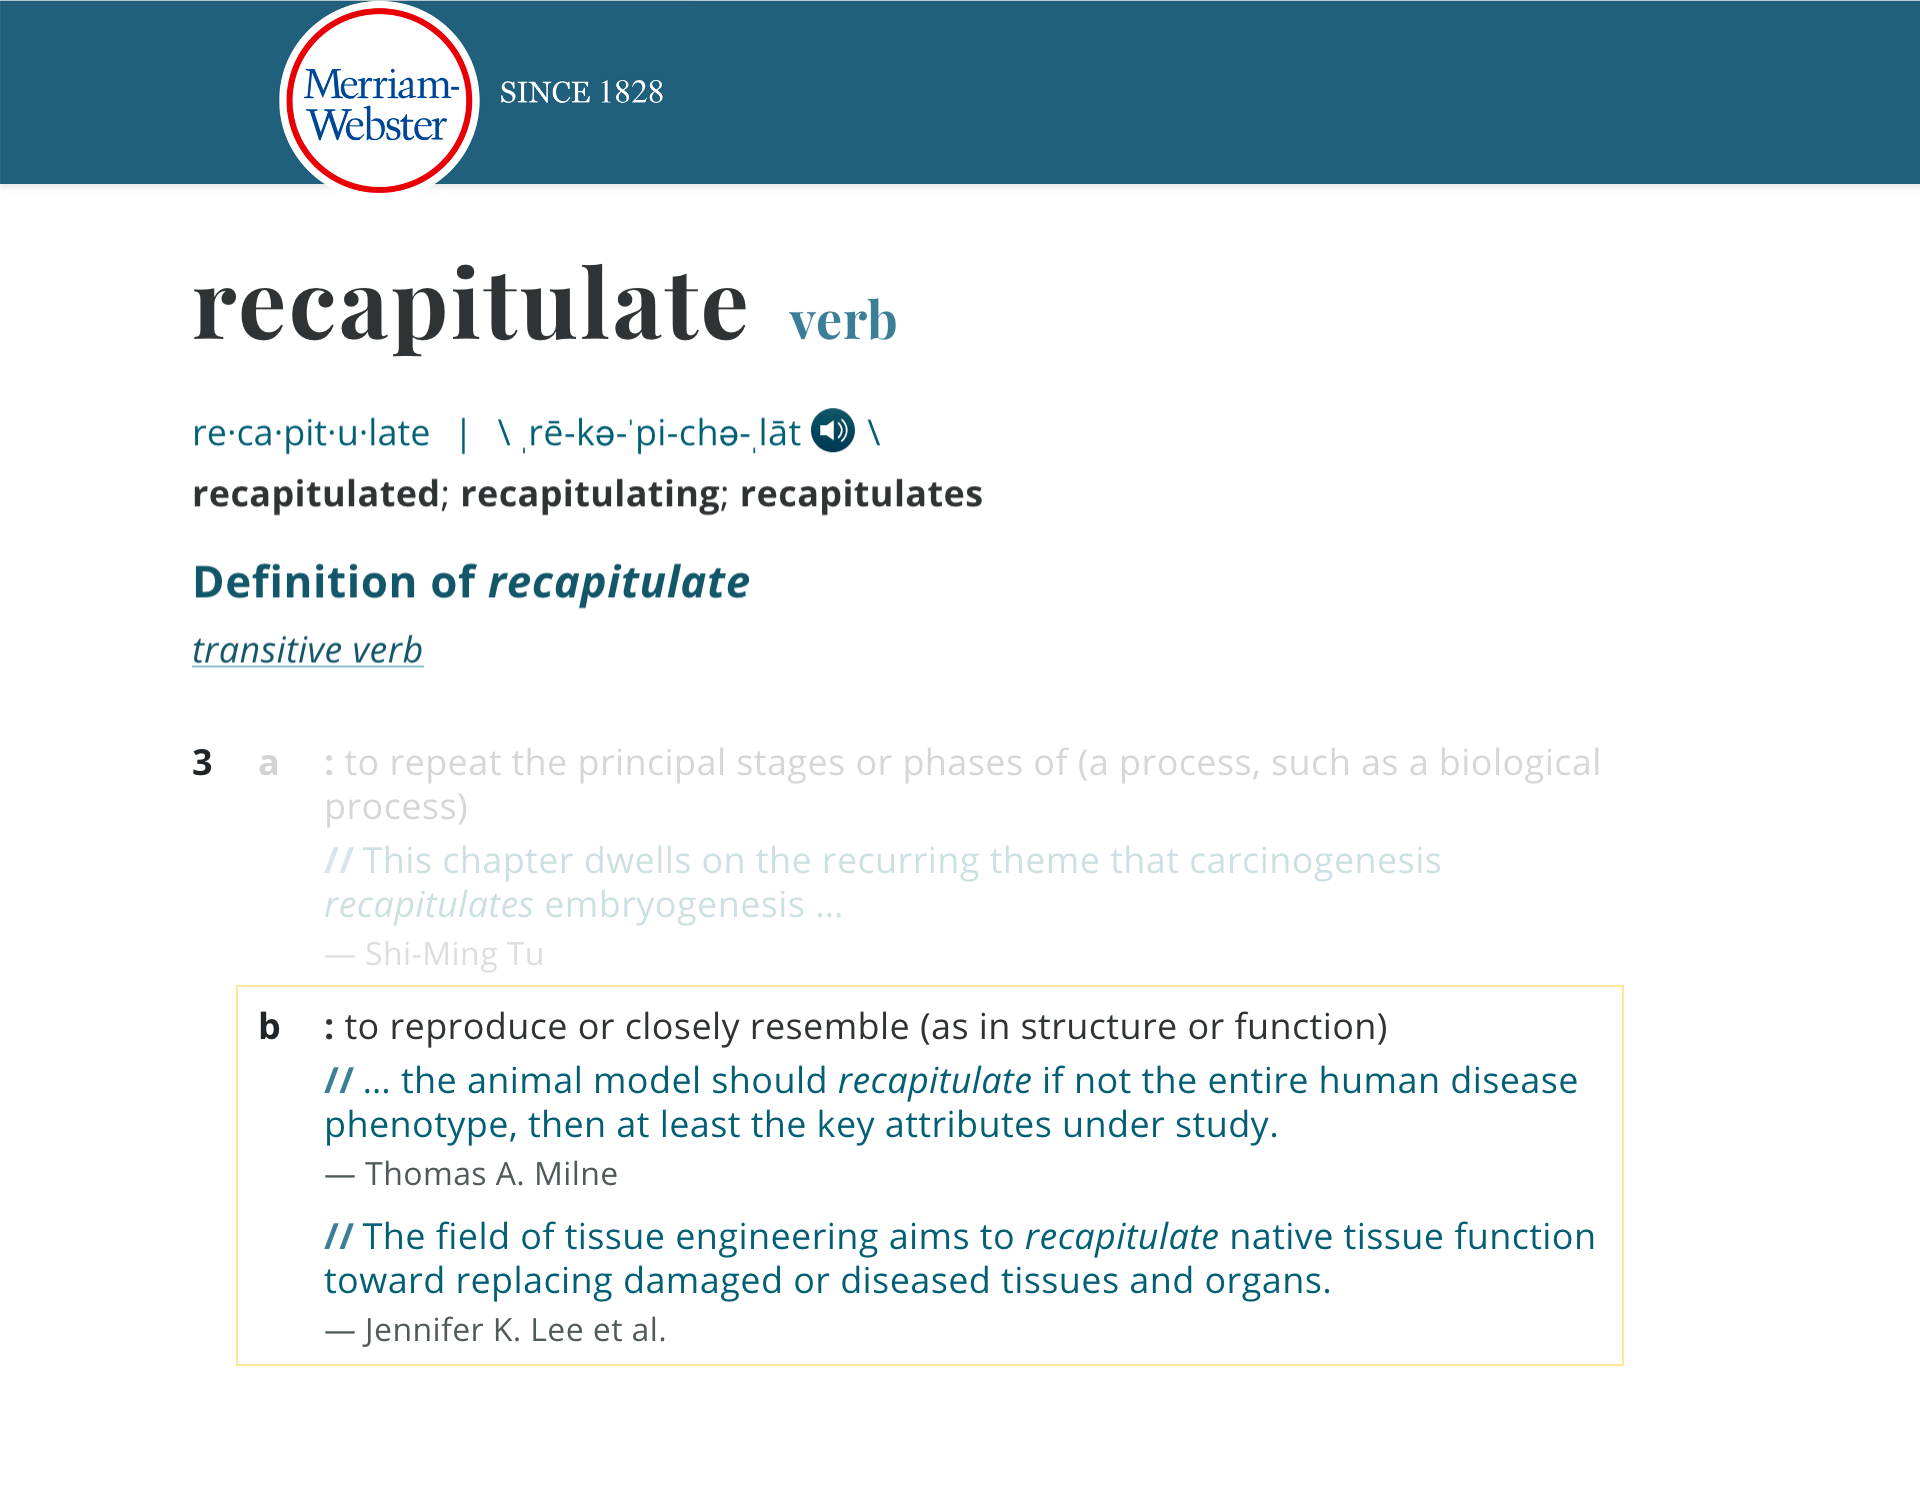 the Motivate - Scar: Recapitulate